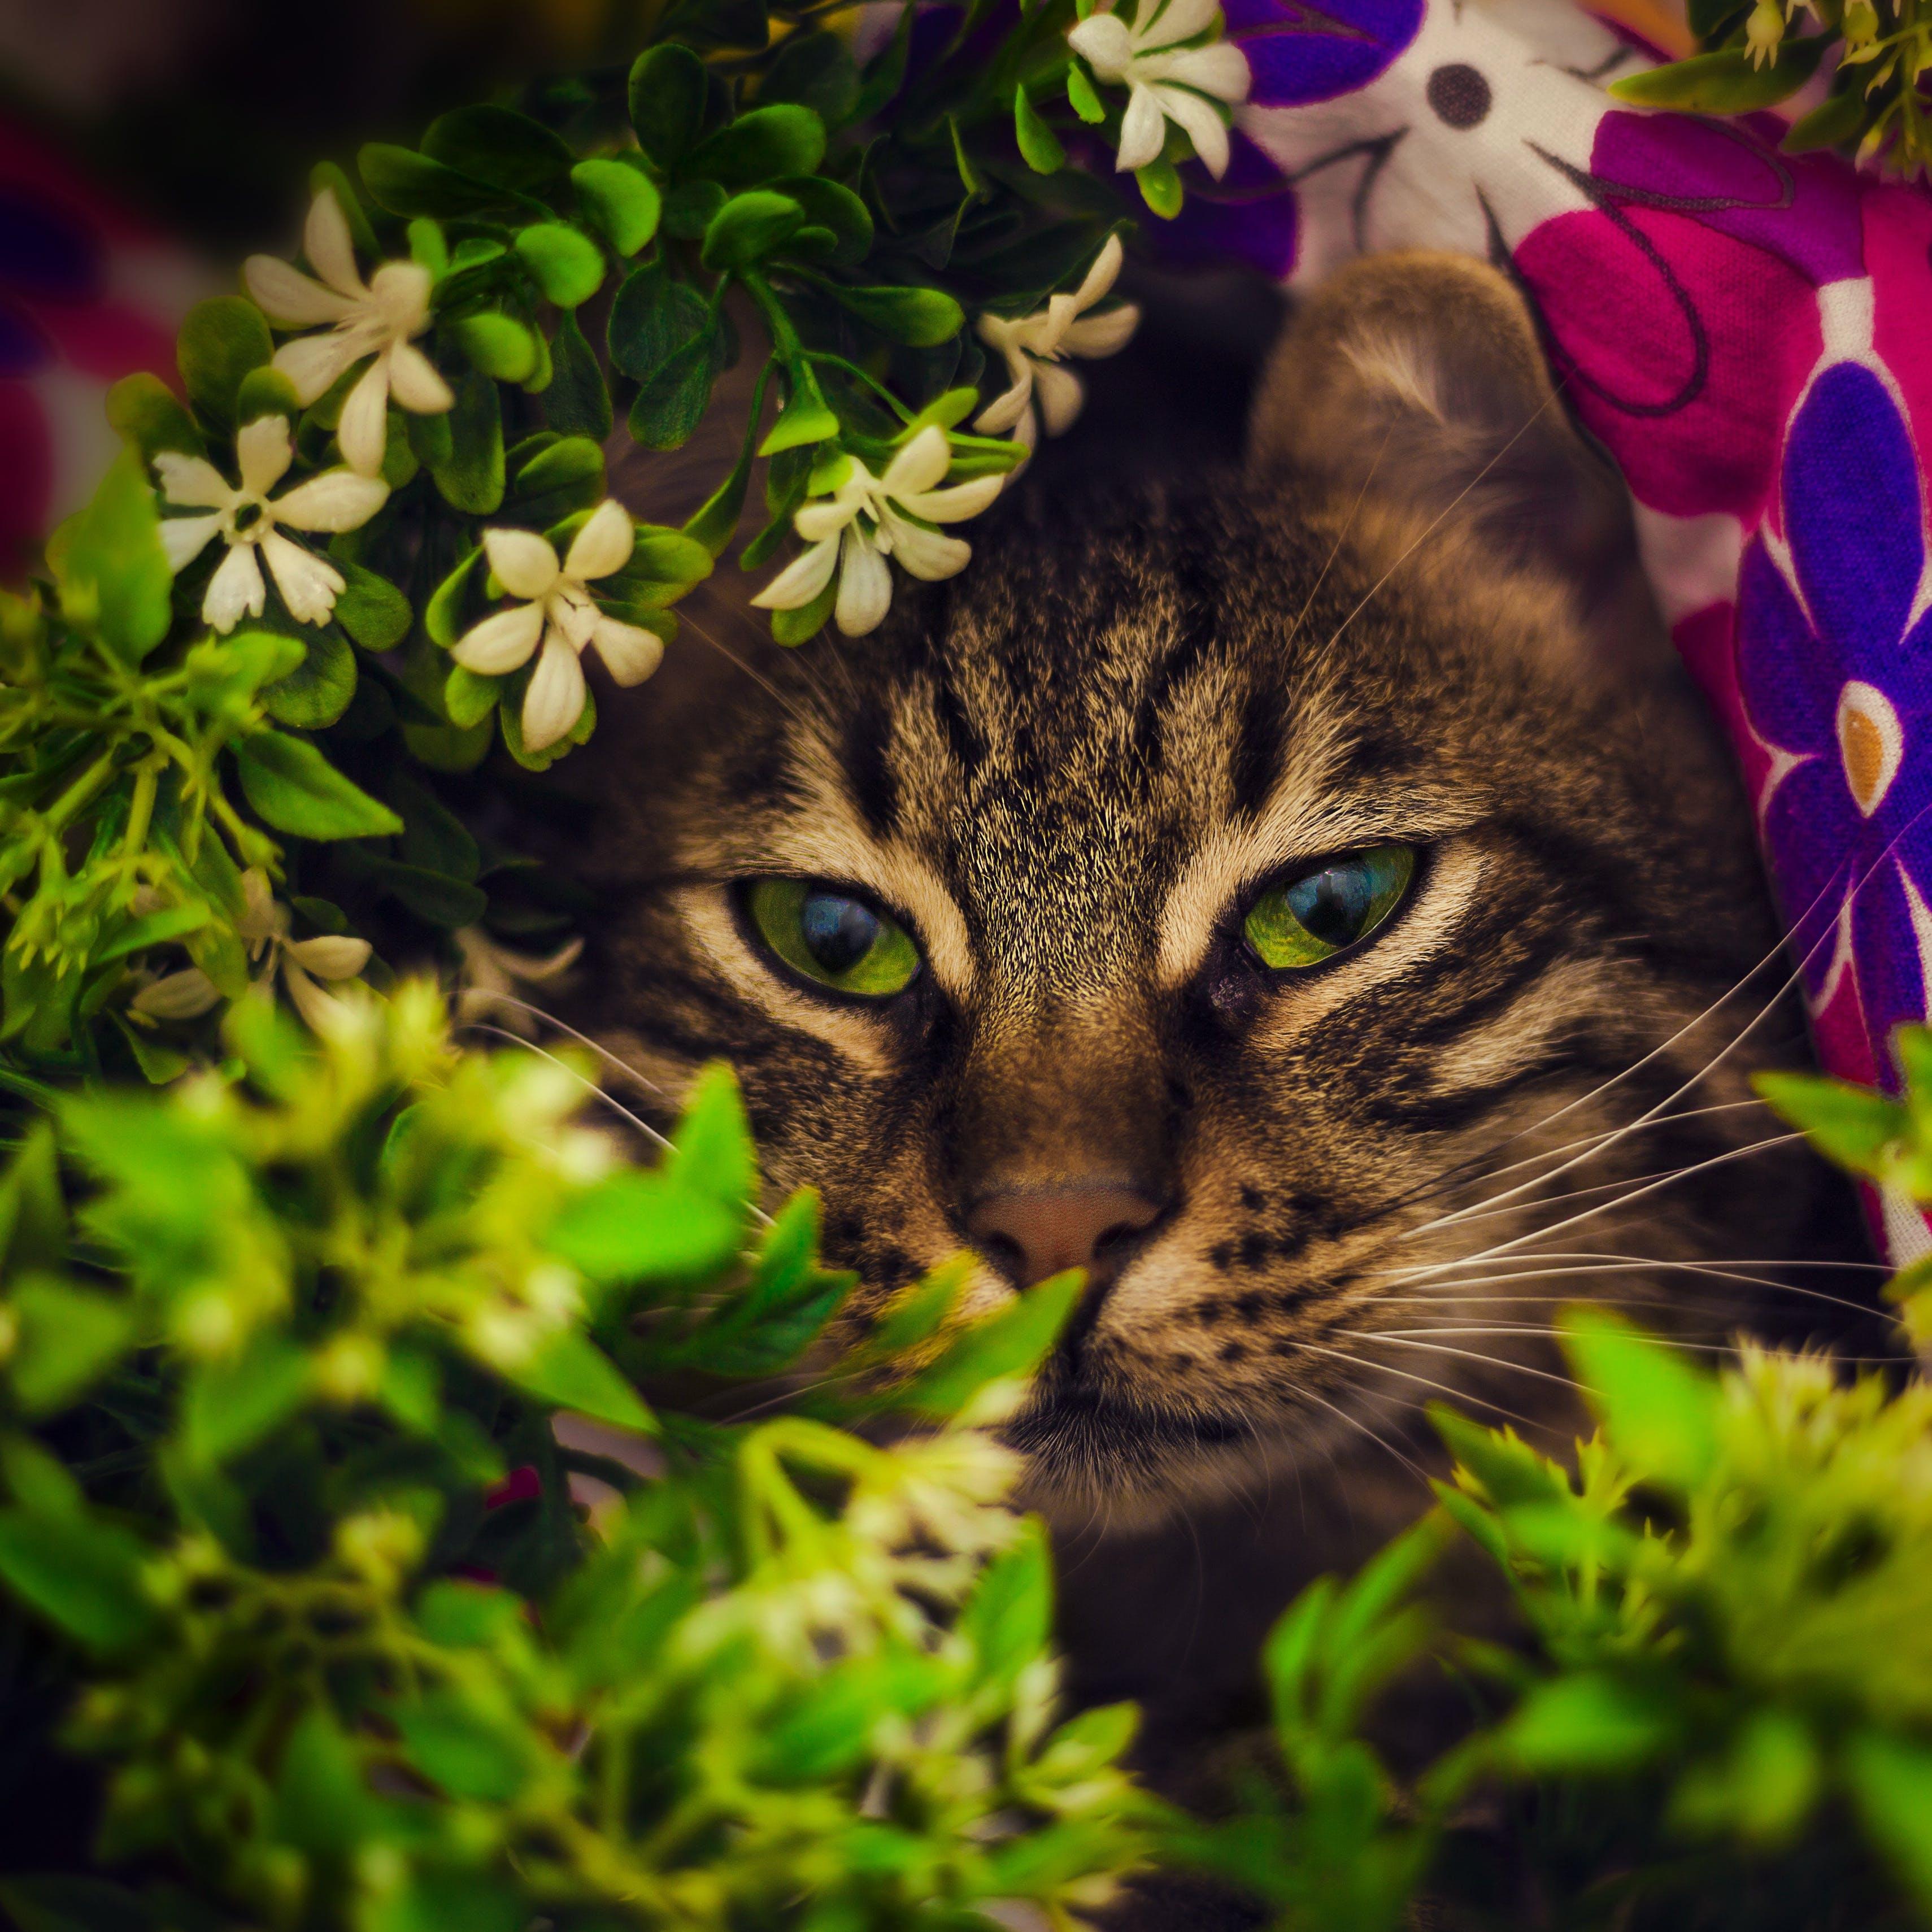 Free stock photo of animal, pet, cute, animals